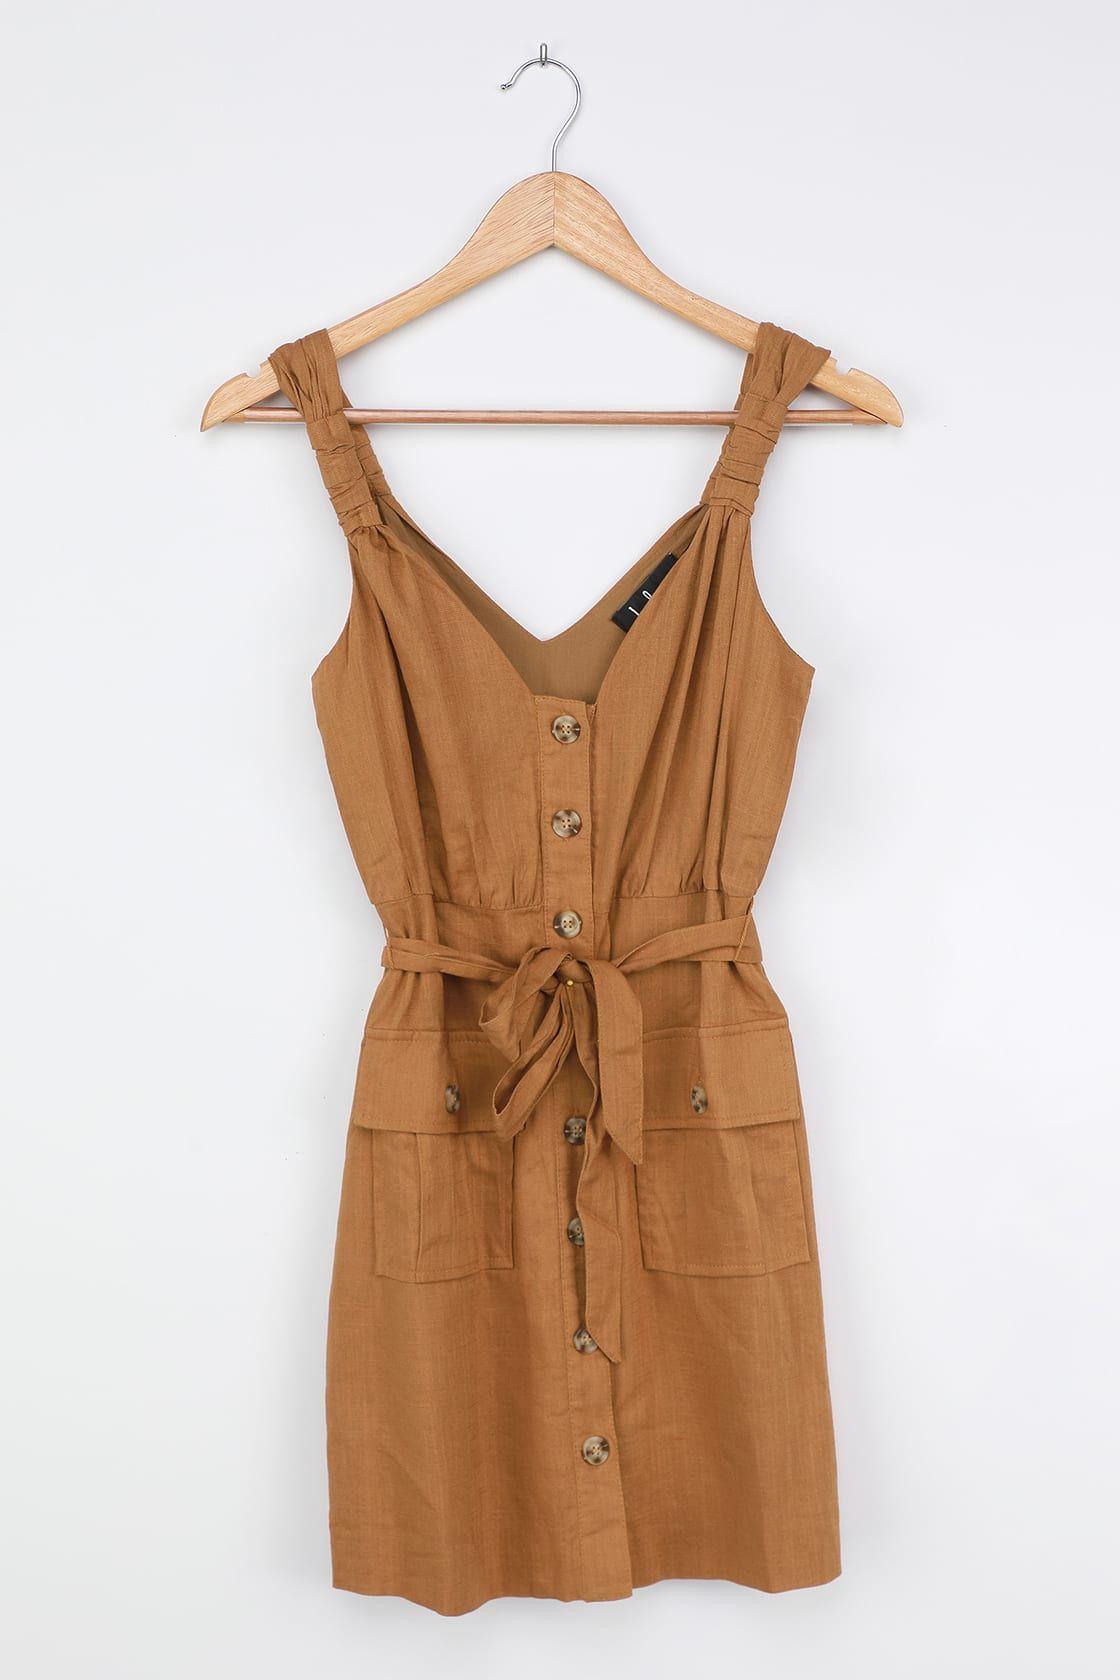 Meant For Greatness Tan Button Front Mini Dress Women Dress Online Mini Dress Fashion [ 1680 x 1120 Pixel ]